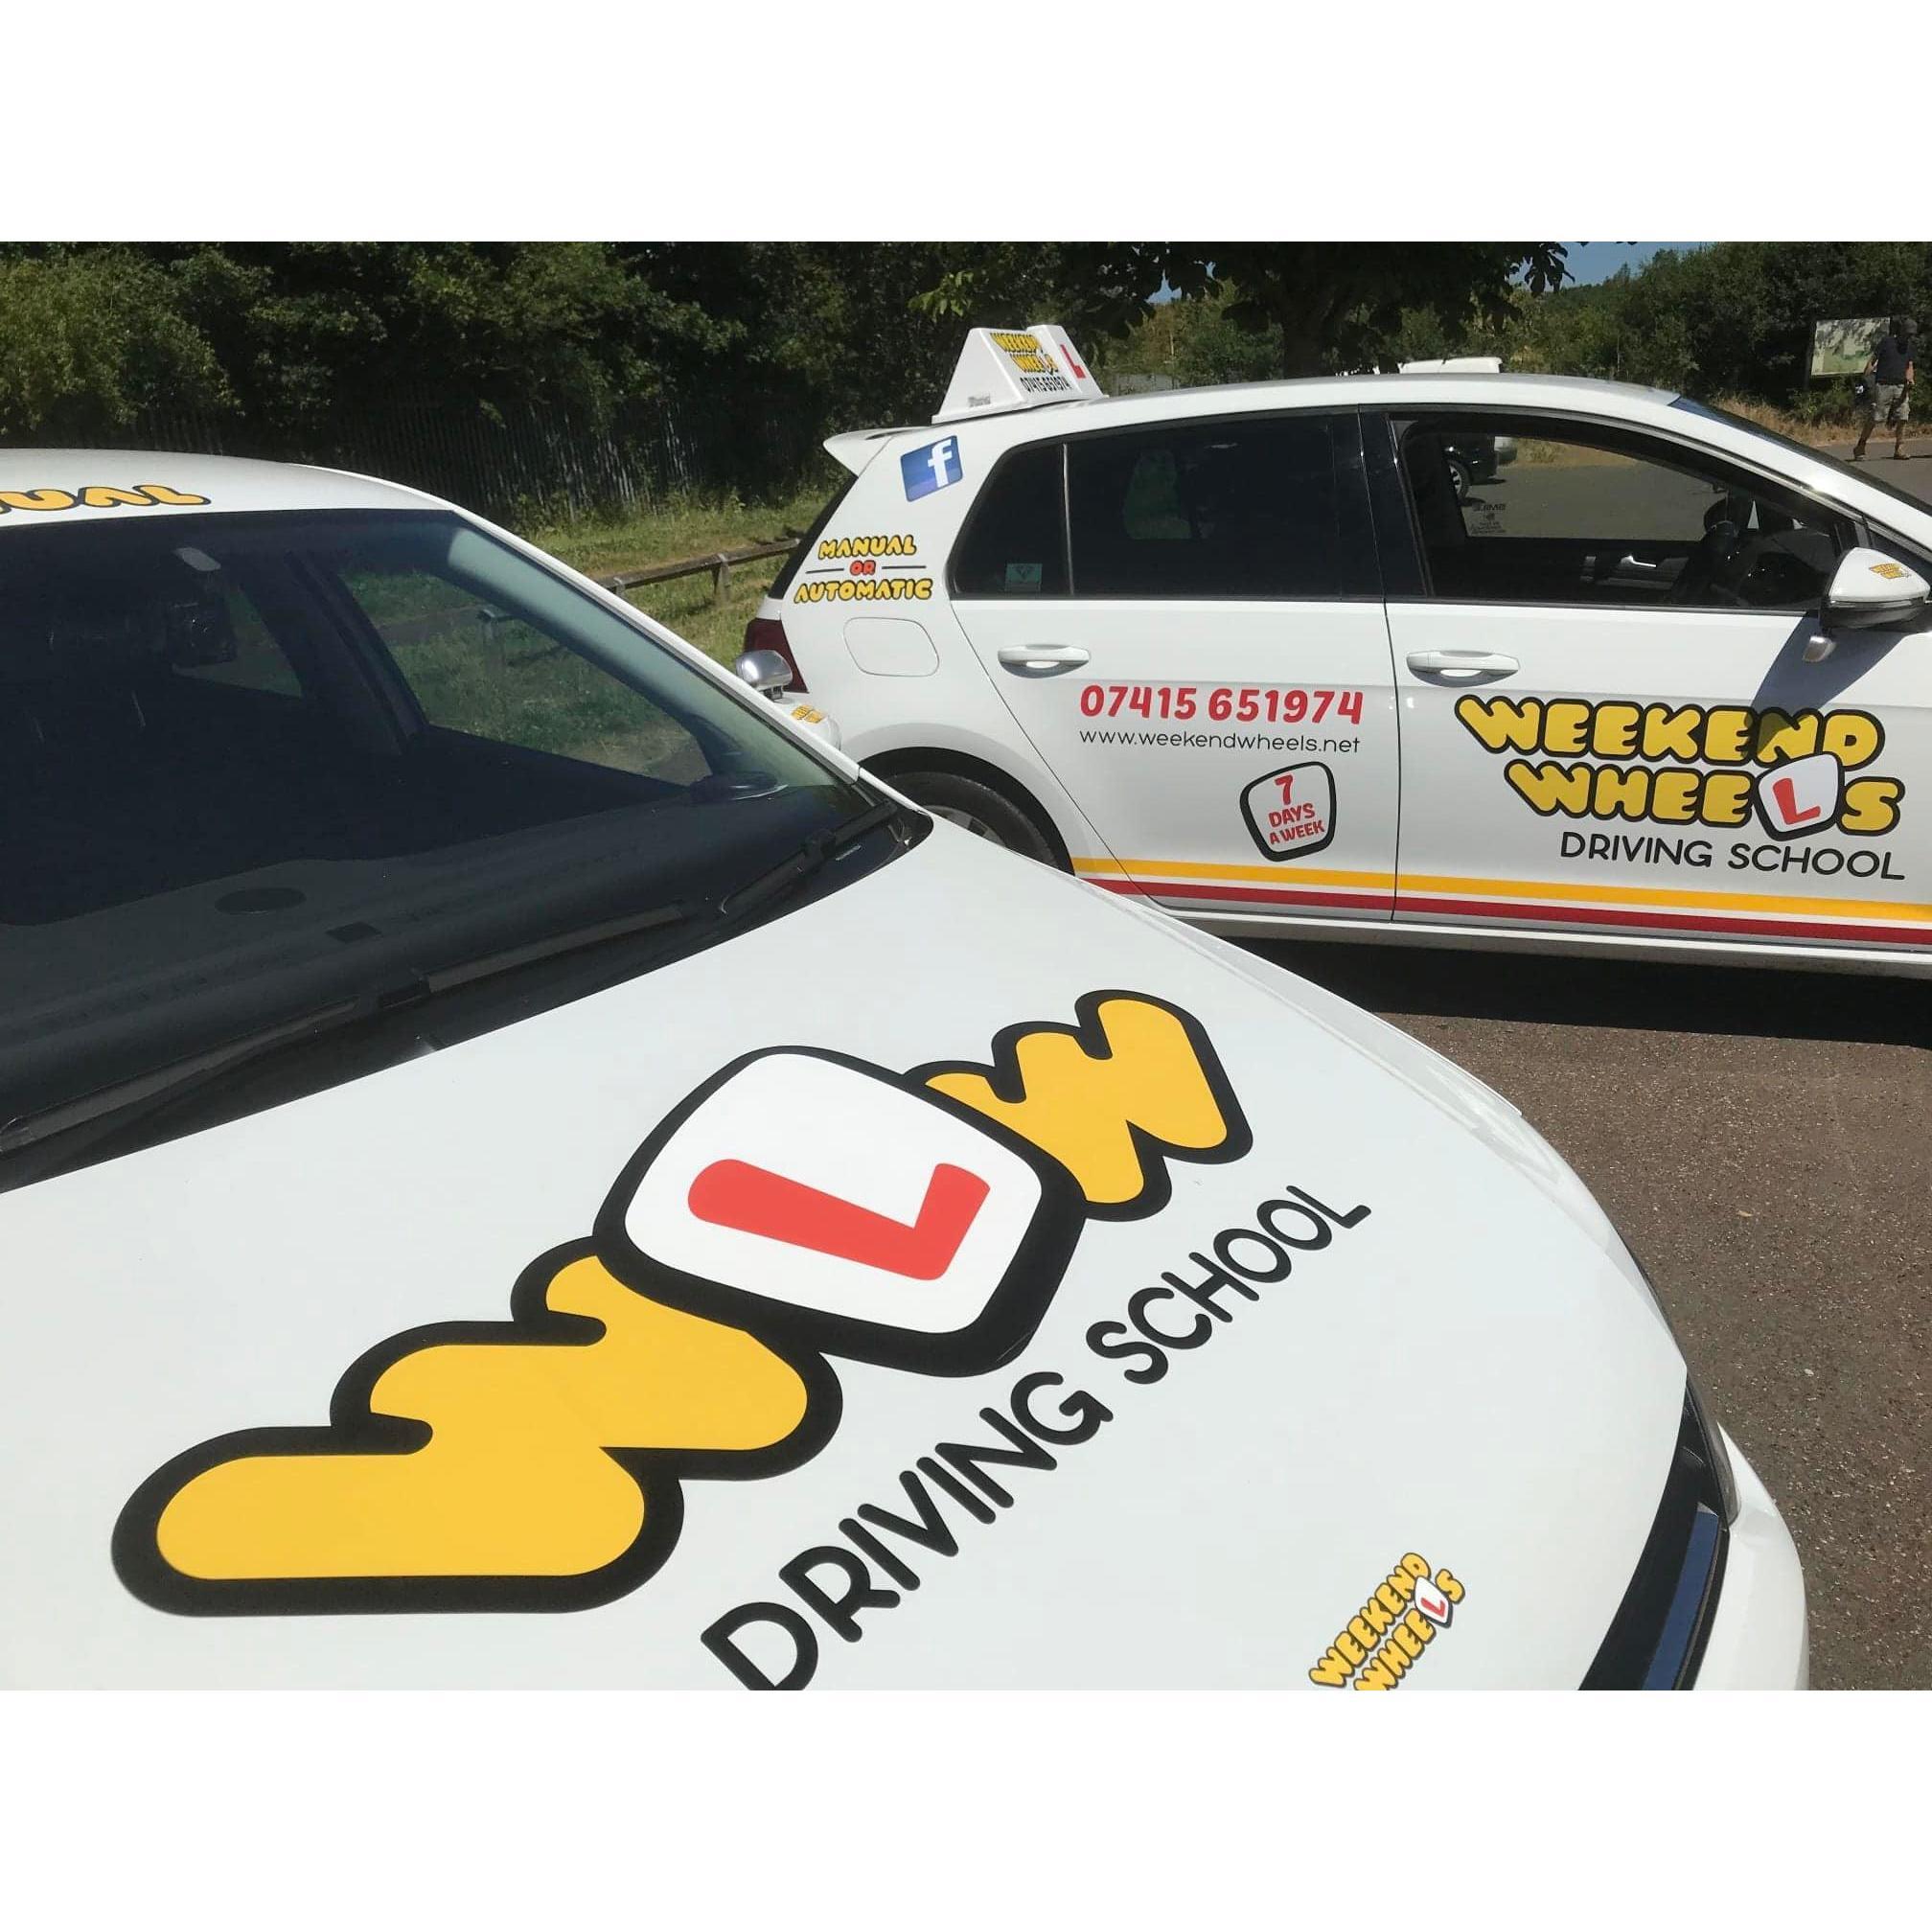 Weekend Wheels Driving School - Northampton, Northamptonshire NN4 6AZ - 07415 651974 | ShowMeLocal.com